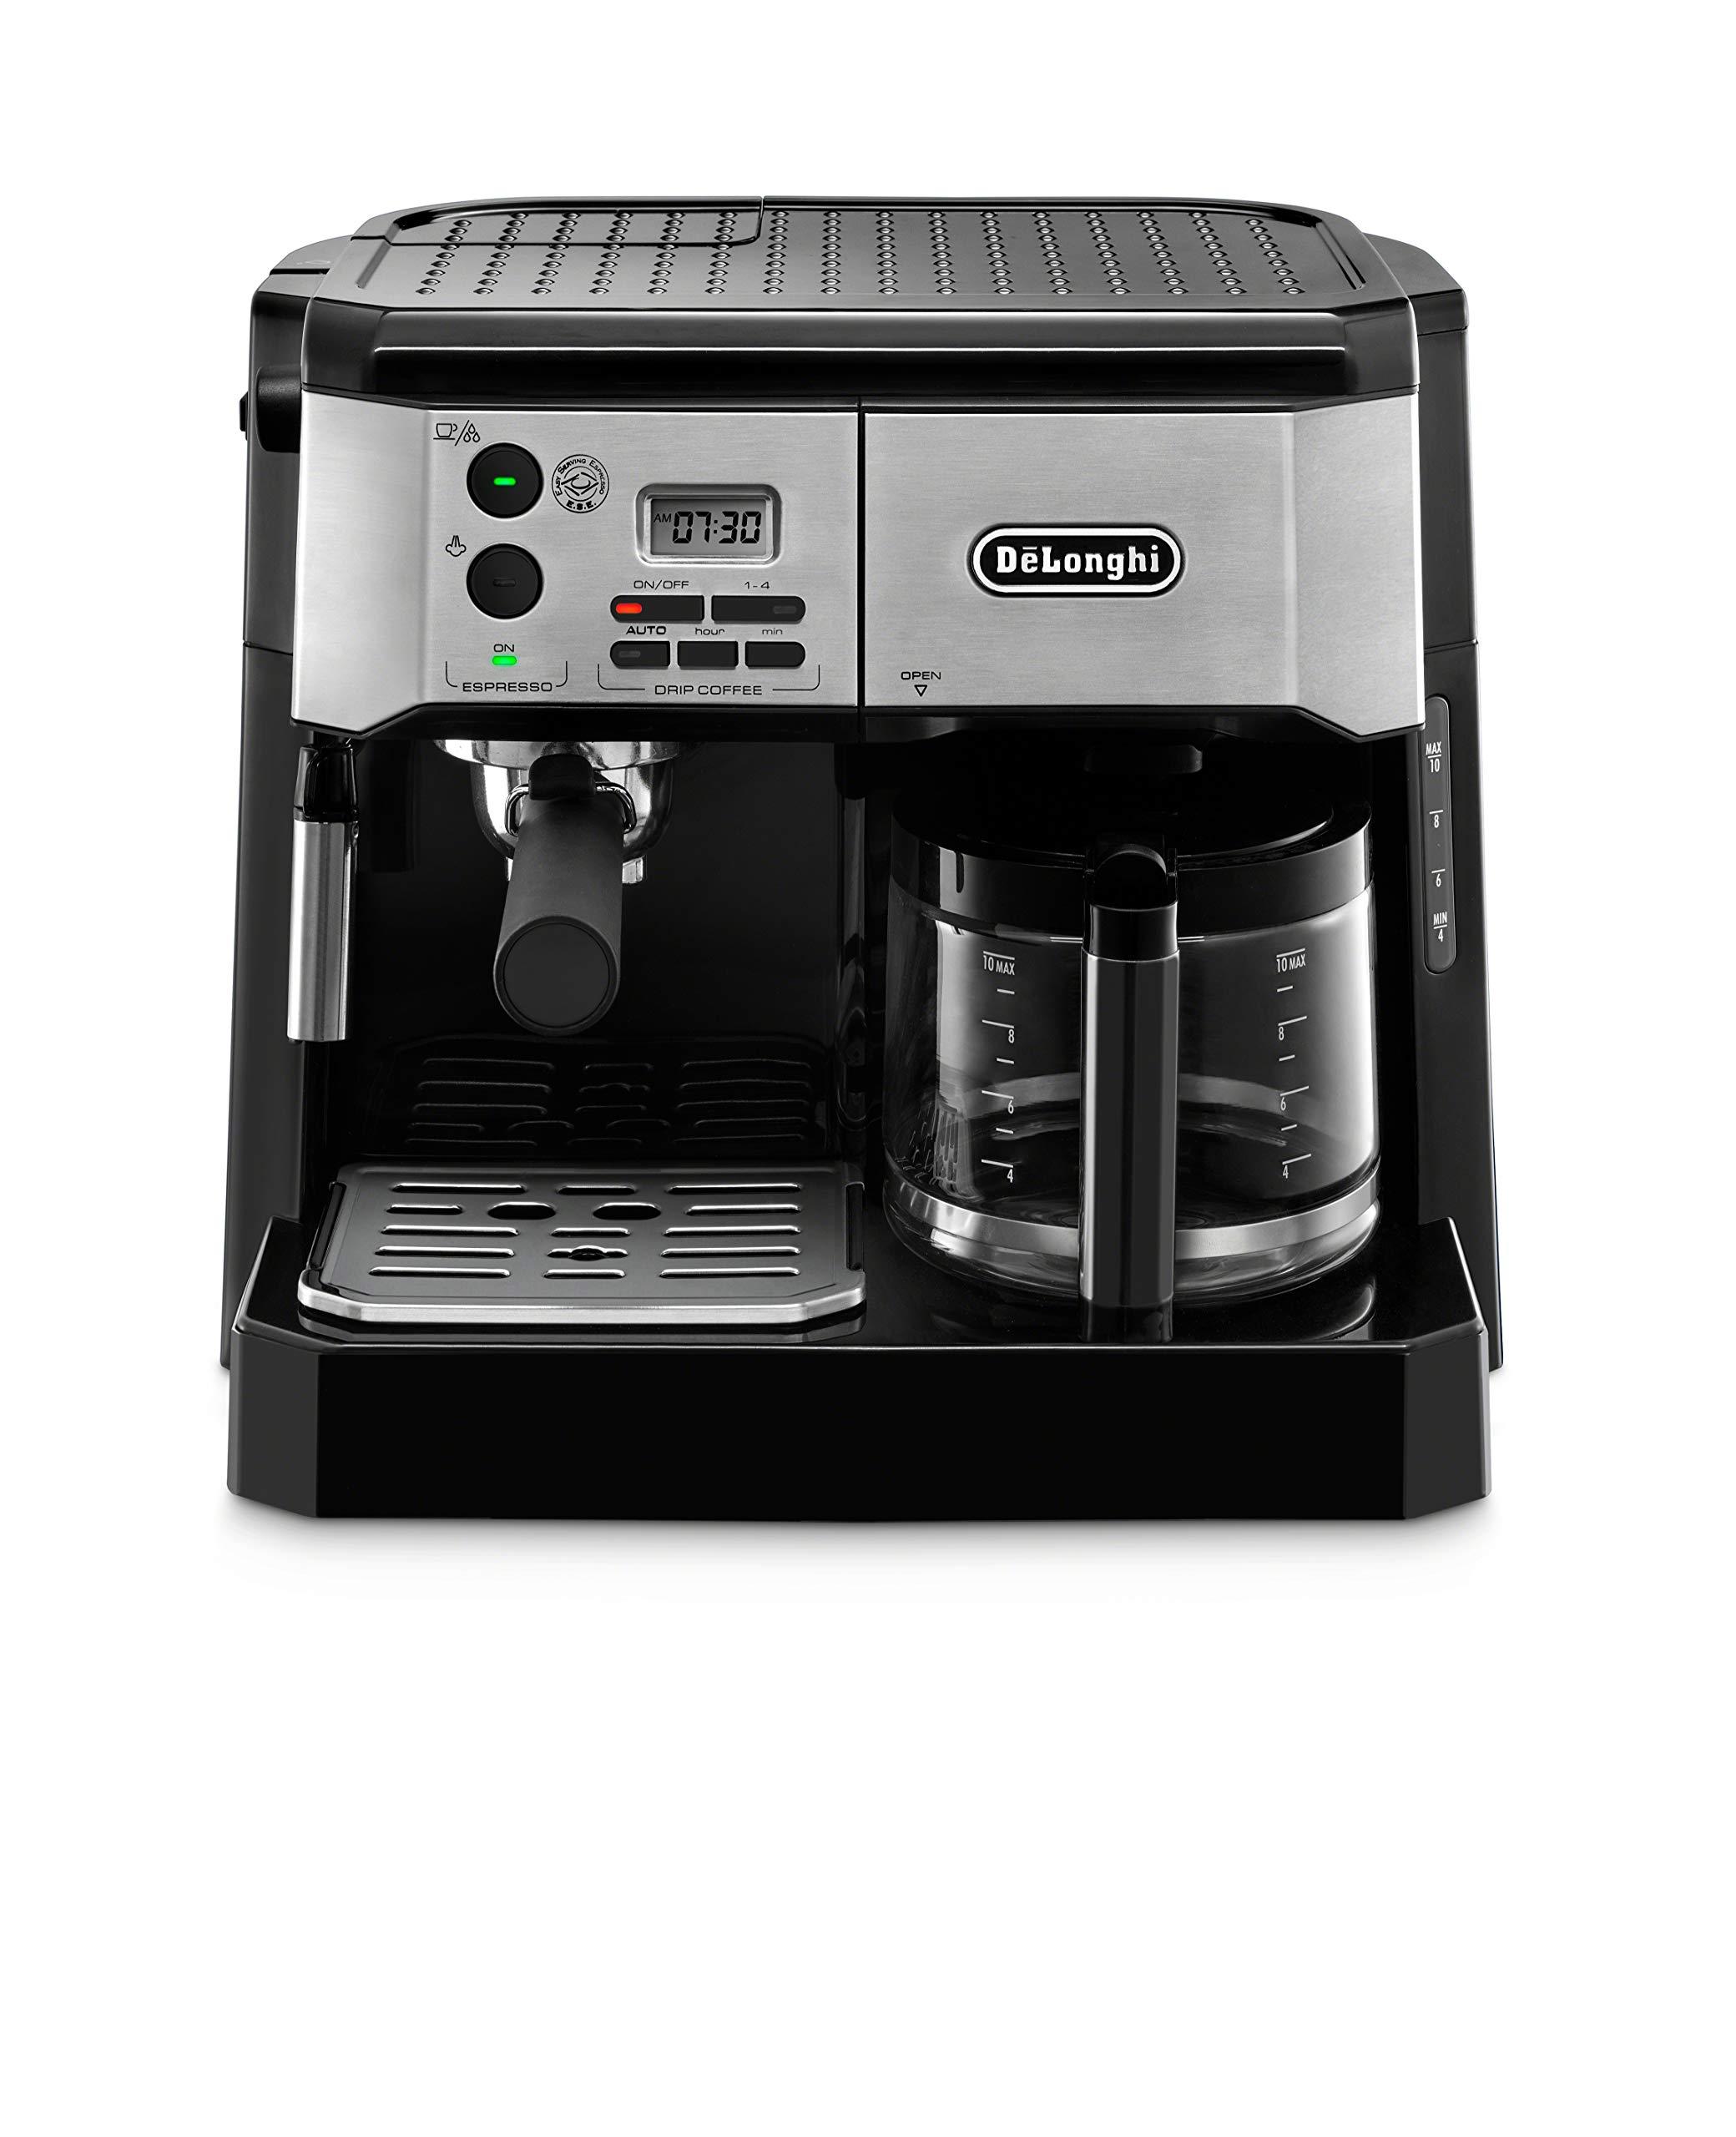 DeLonghi BCO430BM Combination Espresso Cappuccino